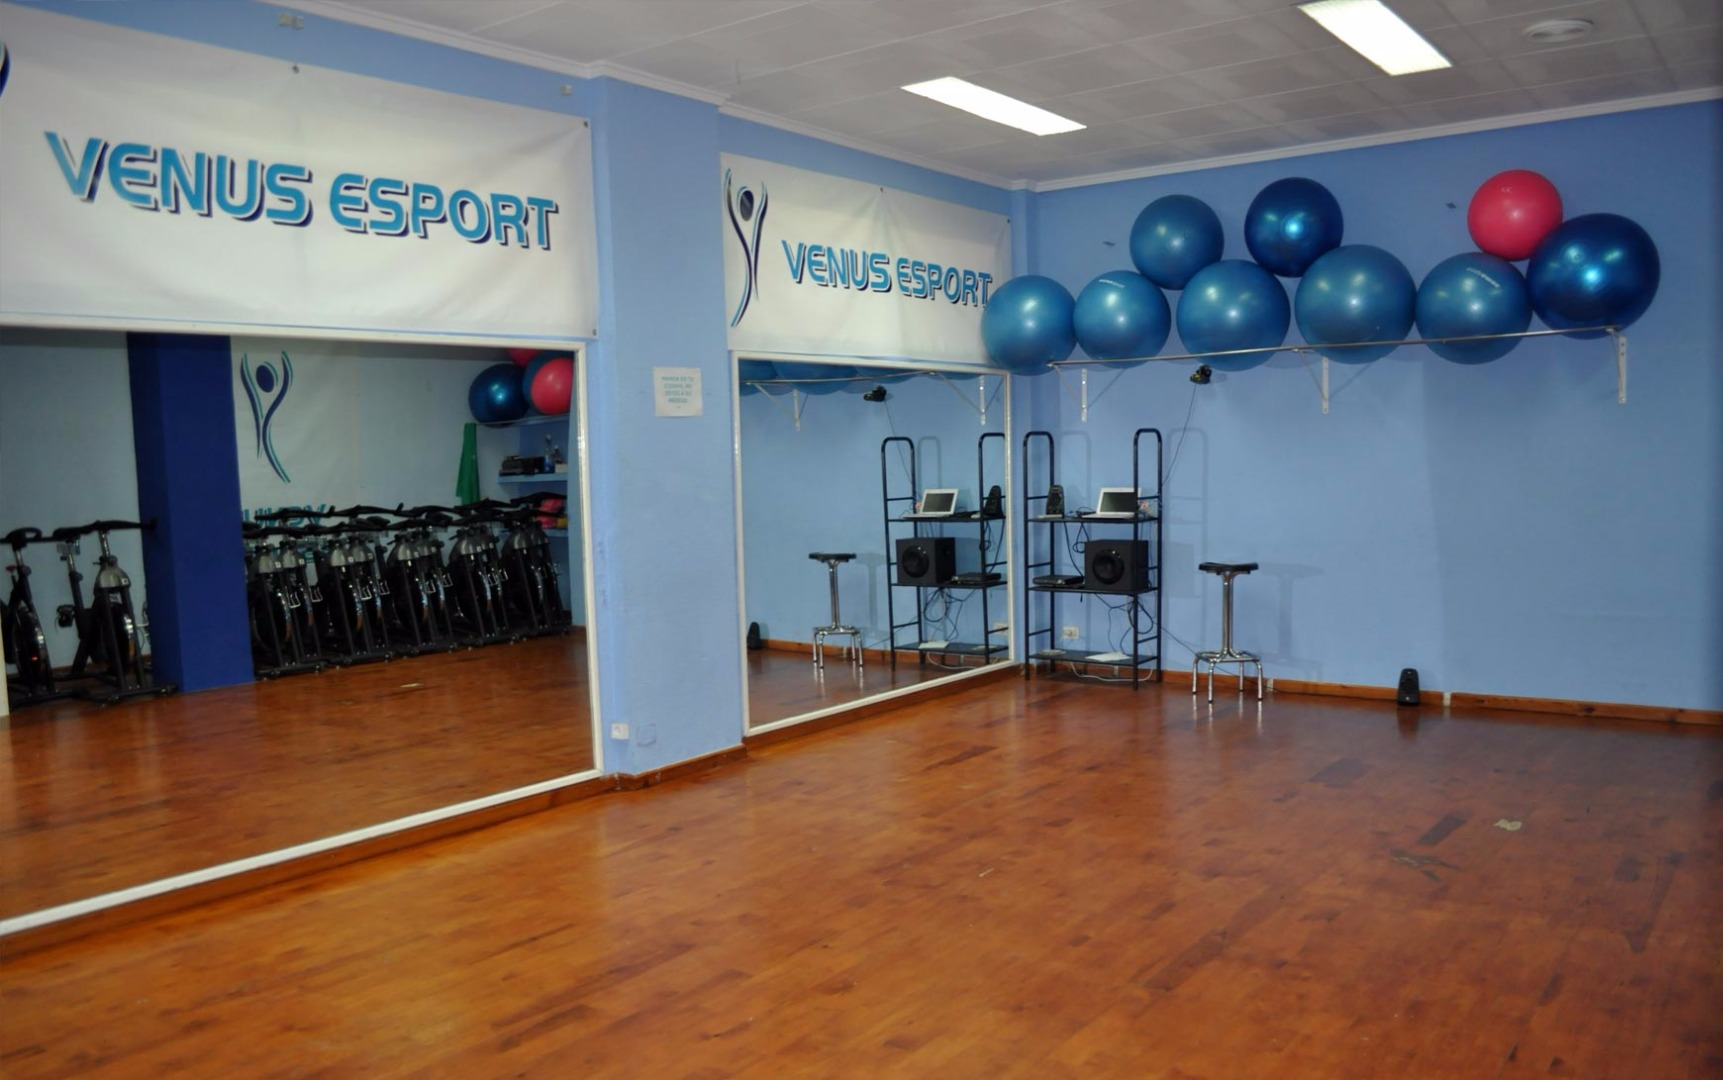 Oferta gimnasio gimnasio femenino venus esport xirivella for Gimnasio femenino